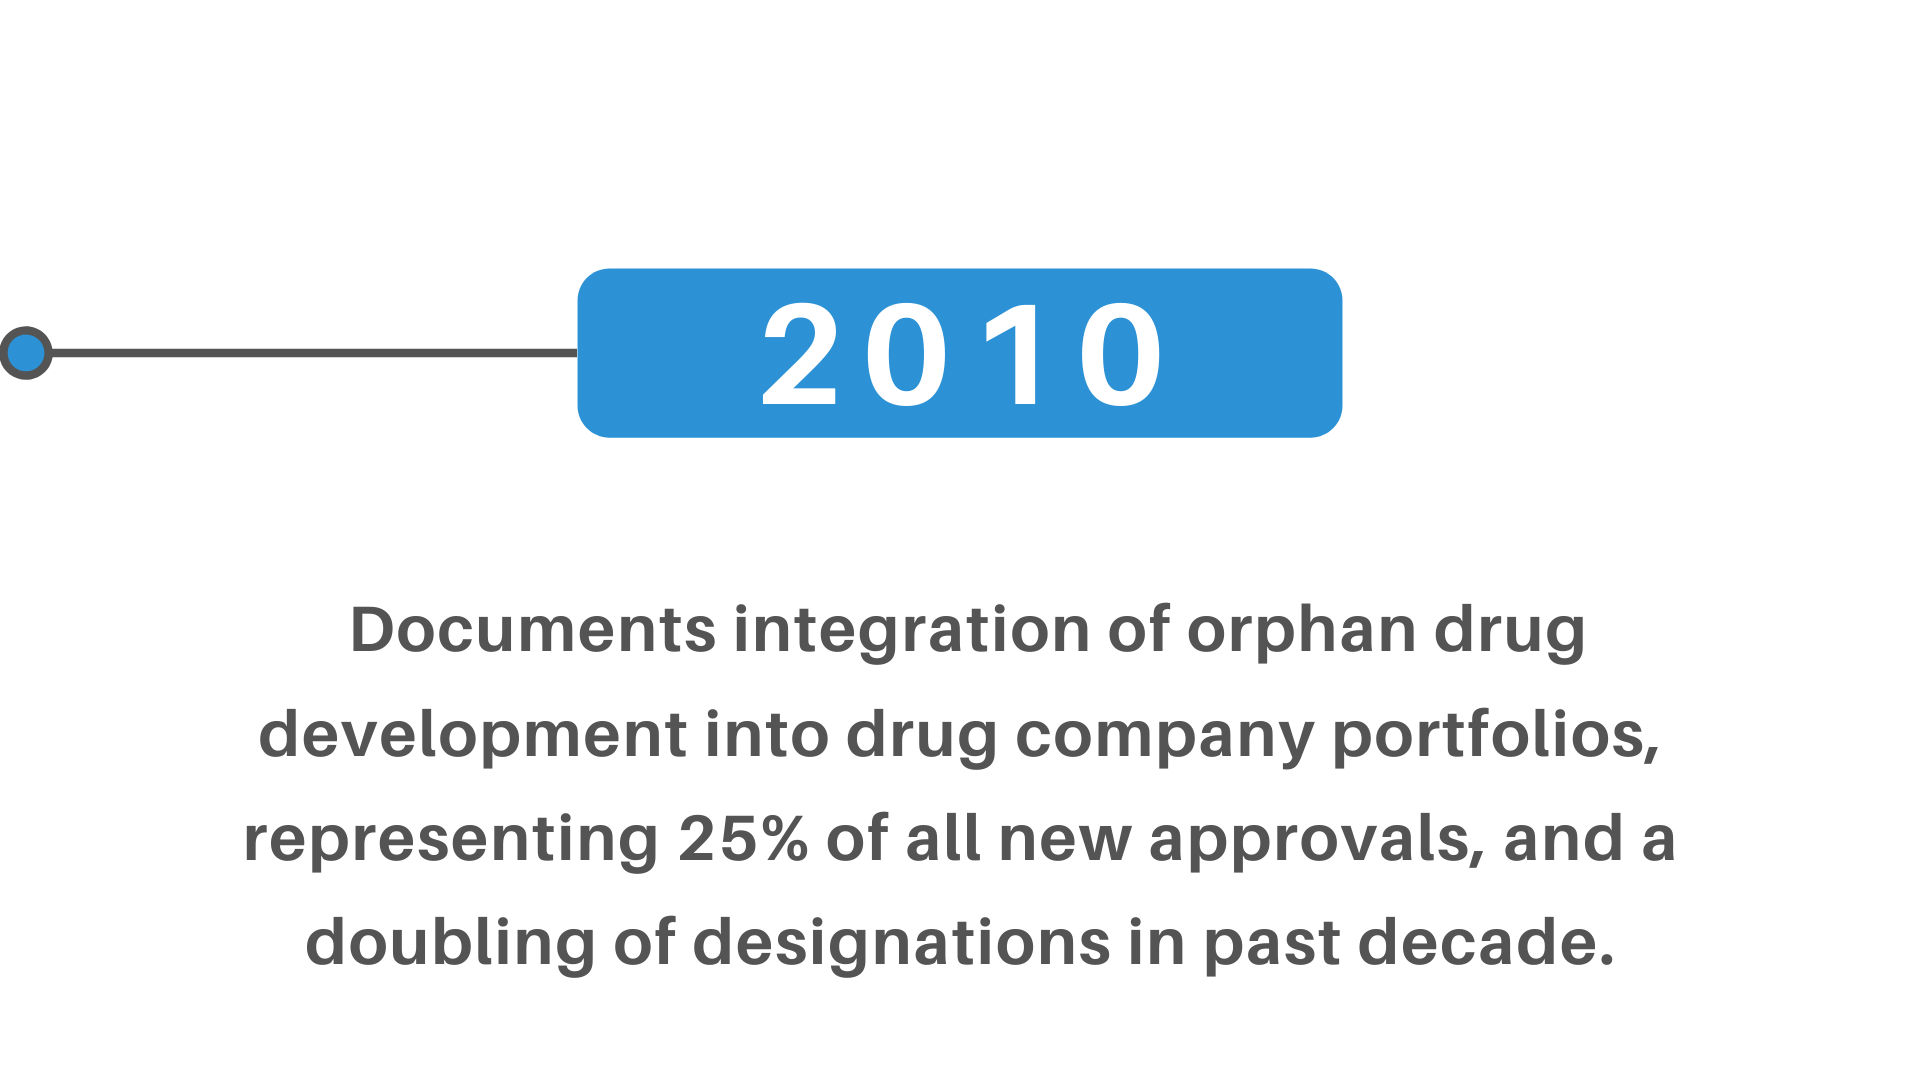 orphan drug development 25% new approvals